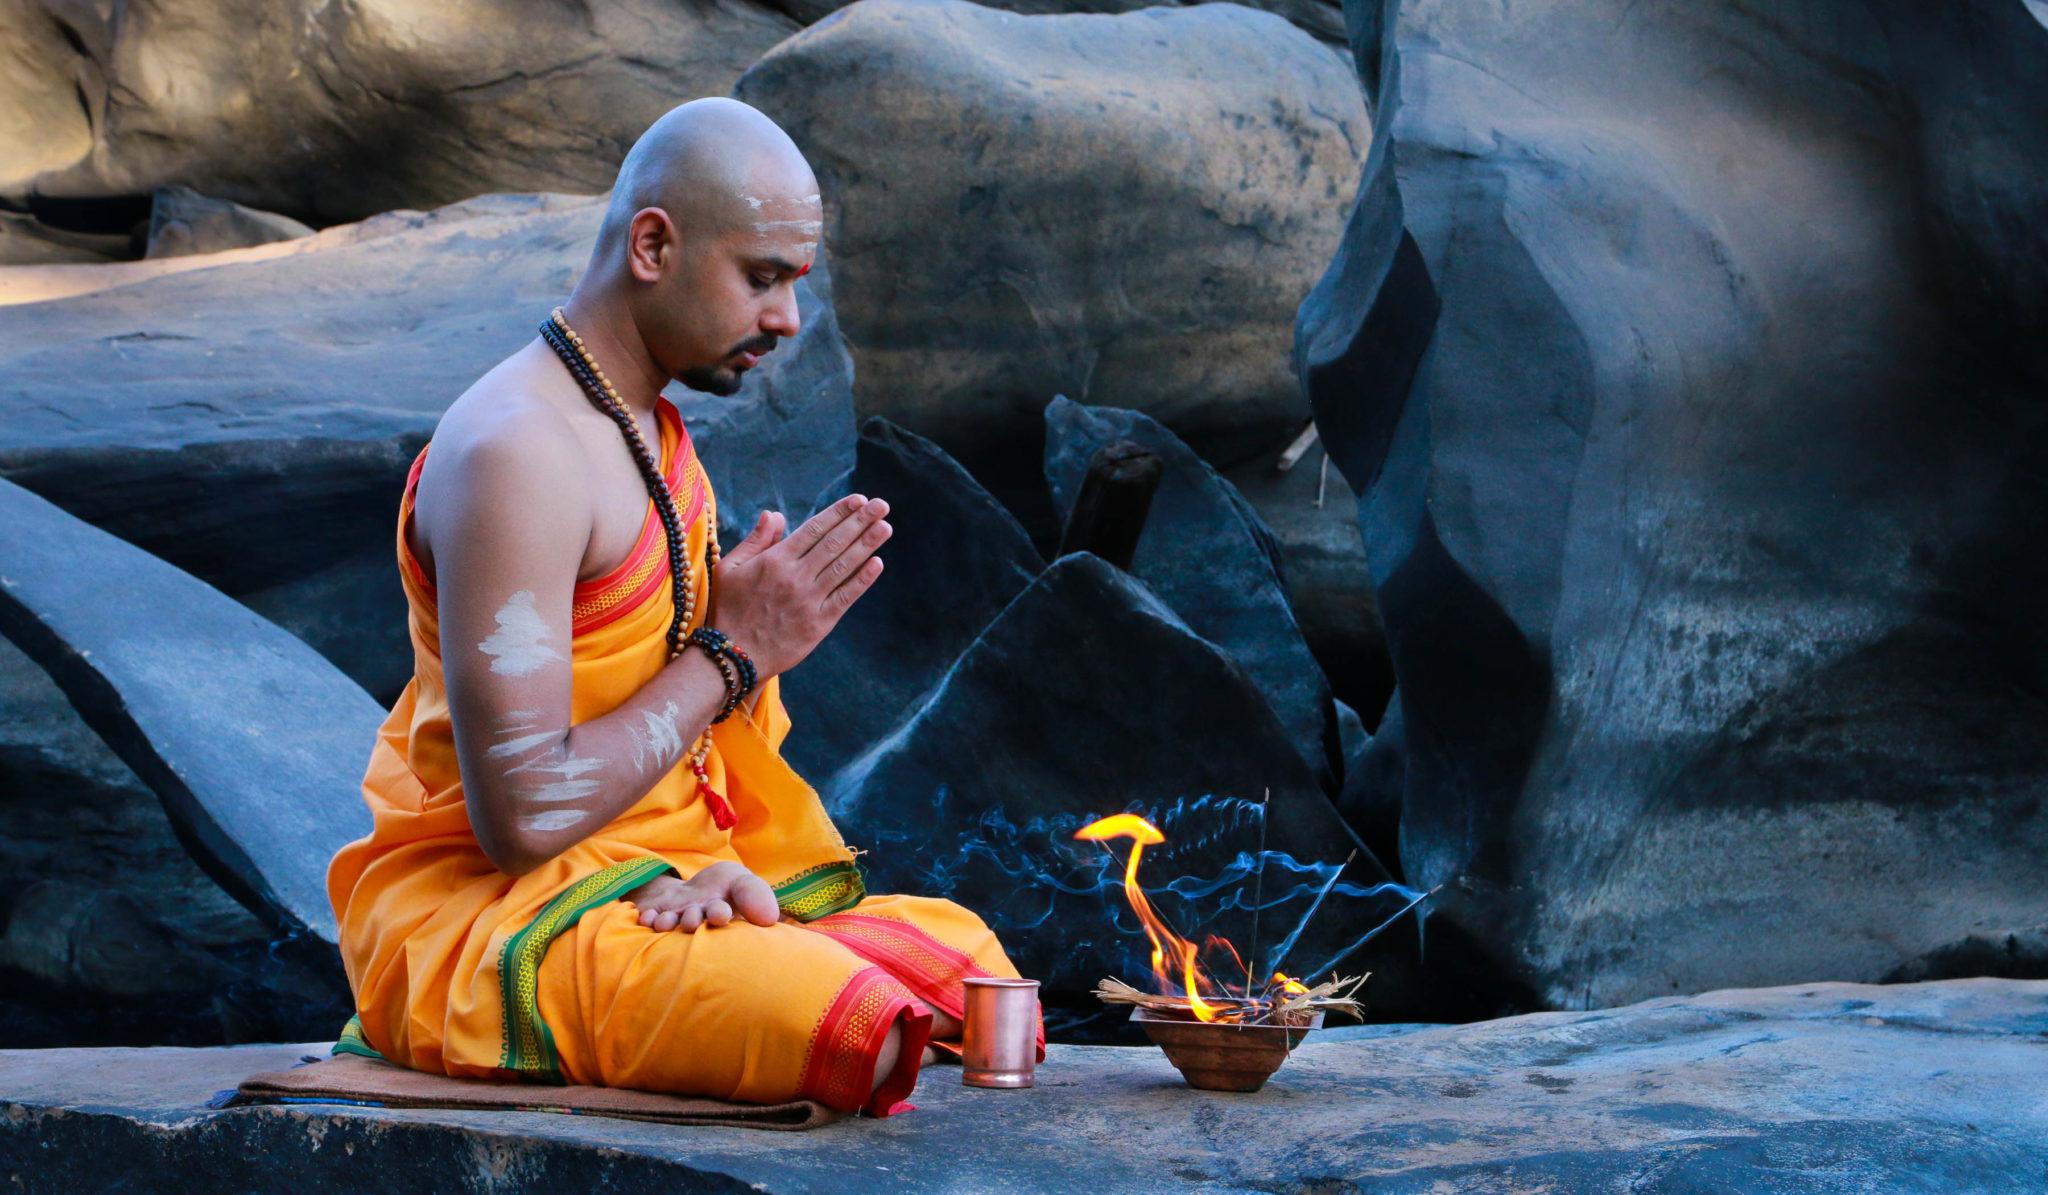 Am deschis Inregistrarile! 200 H Yoga Teacher Training – Awaken The Yoga Teacher Within You